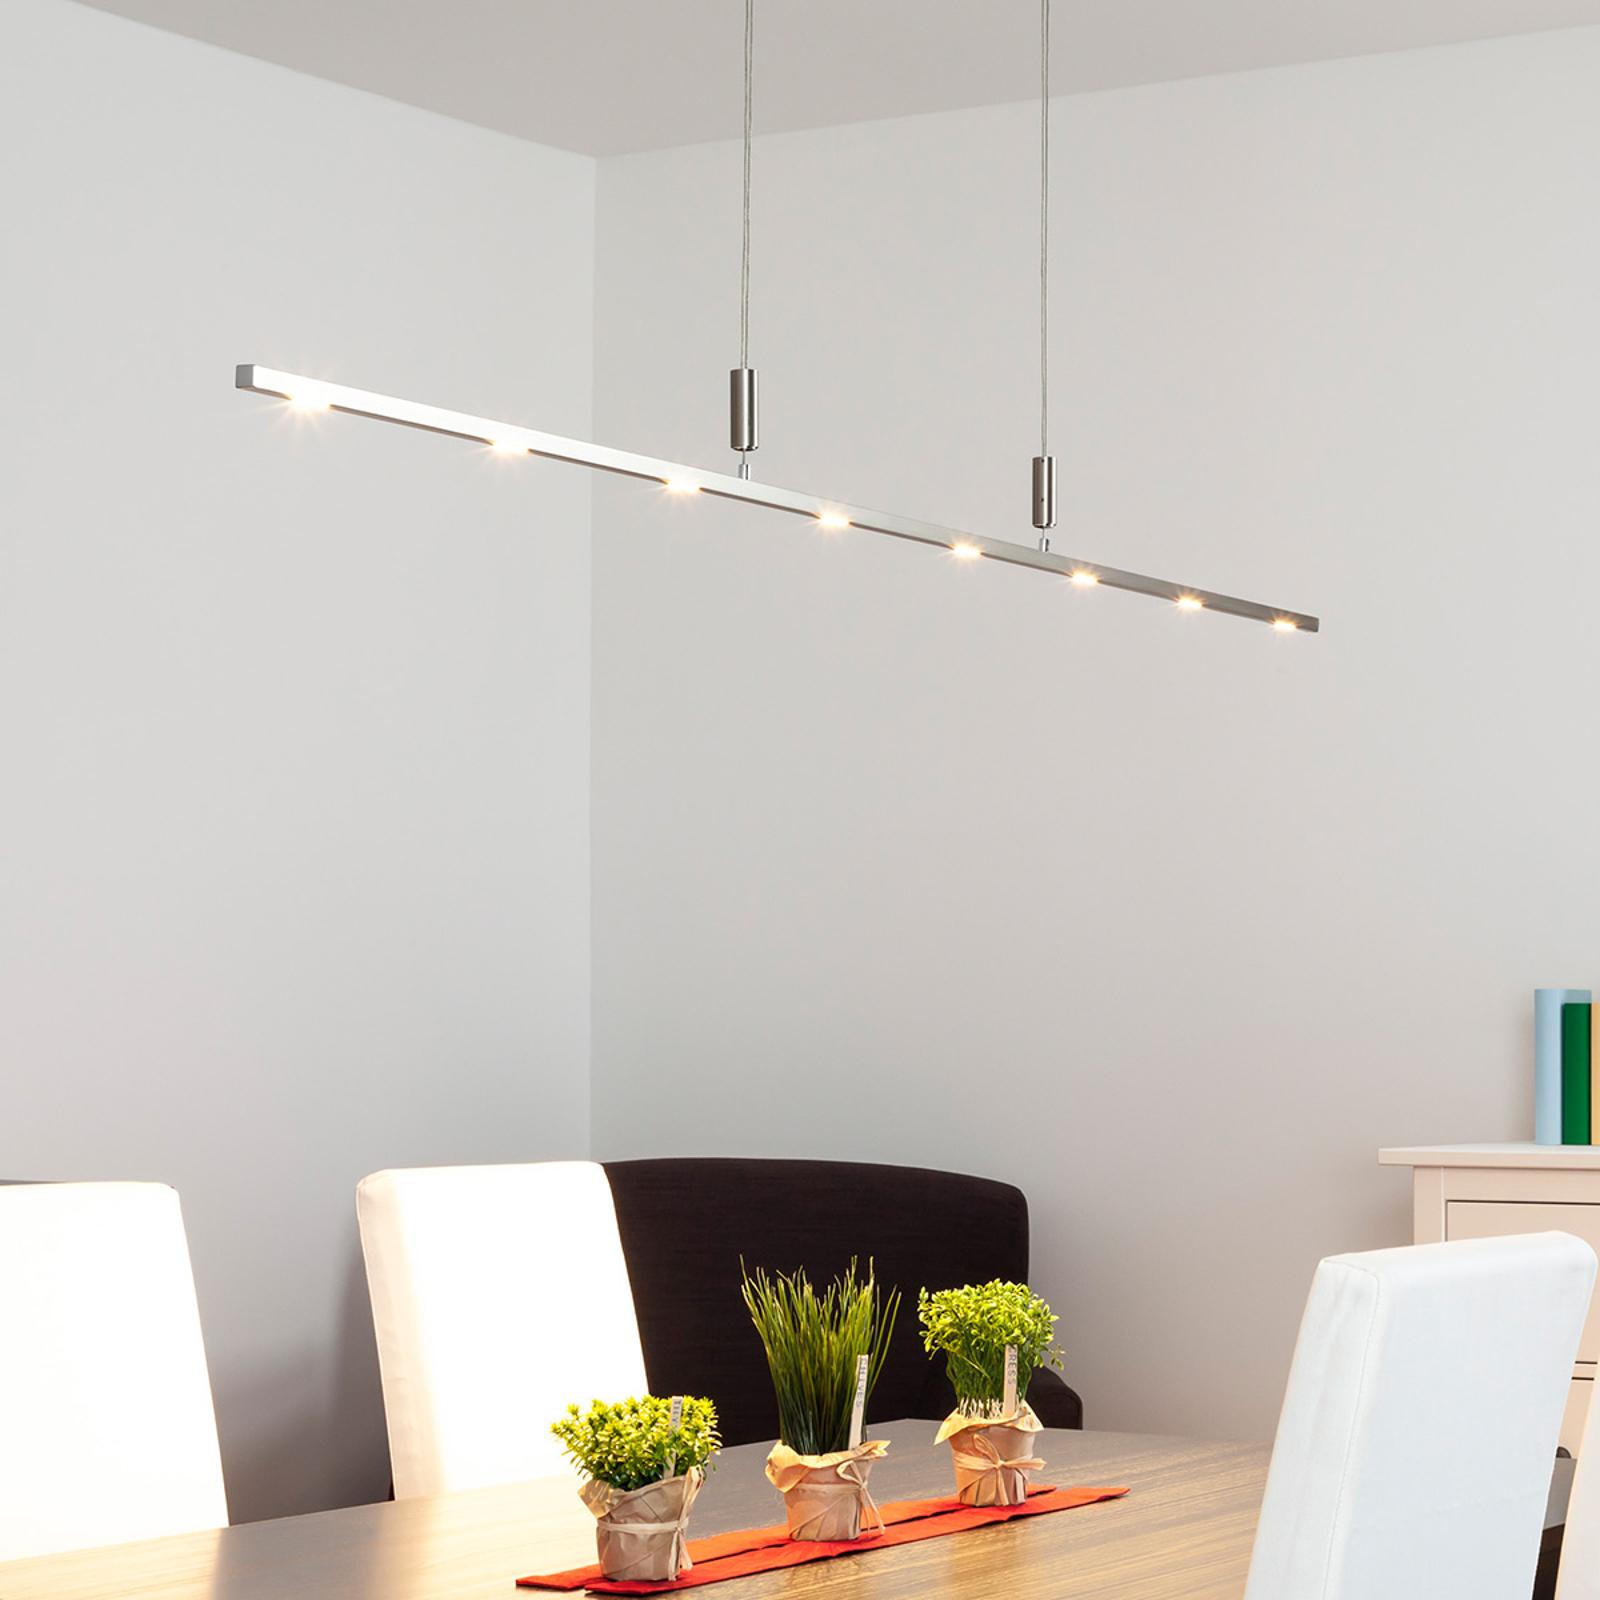 Snella lampada sospesa LED Tolu dimmer., 180 cm